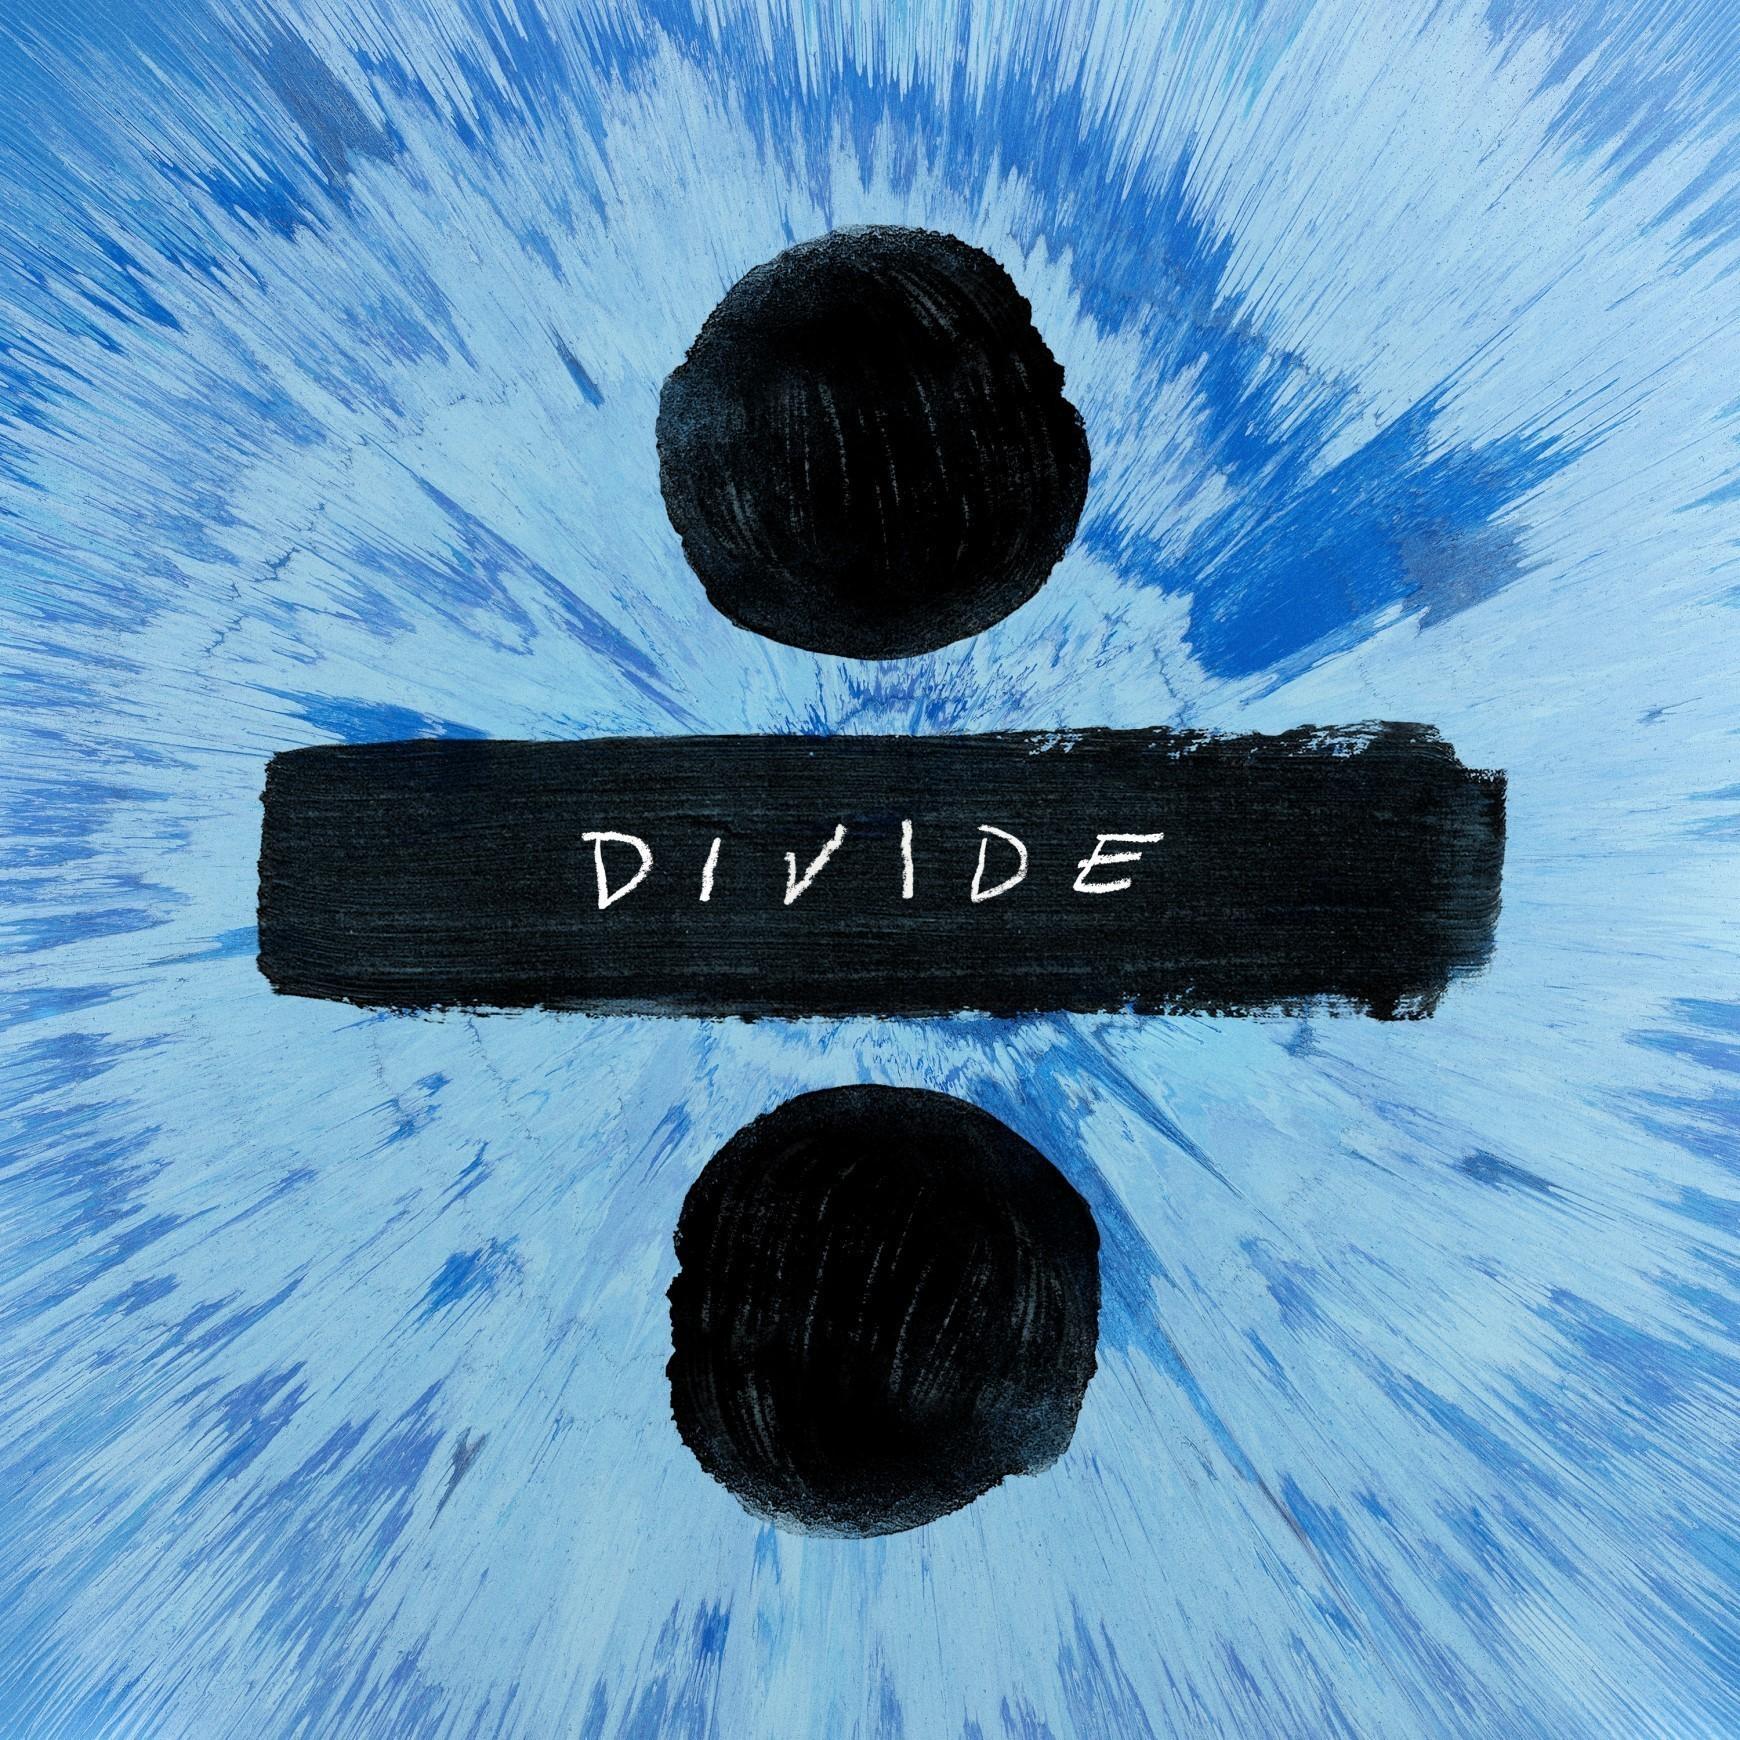 divide_albumcover